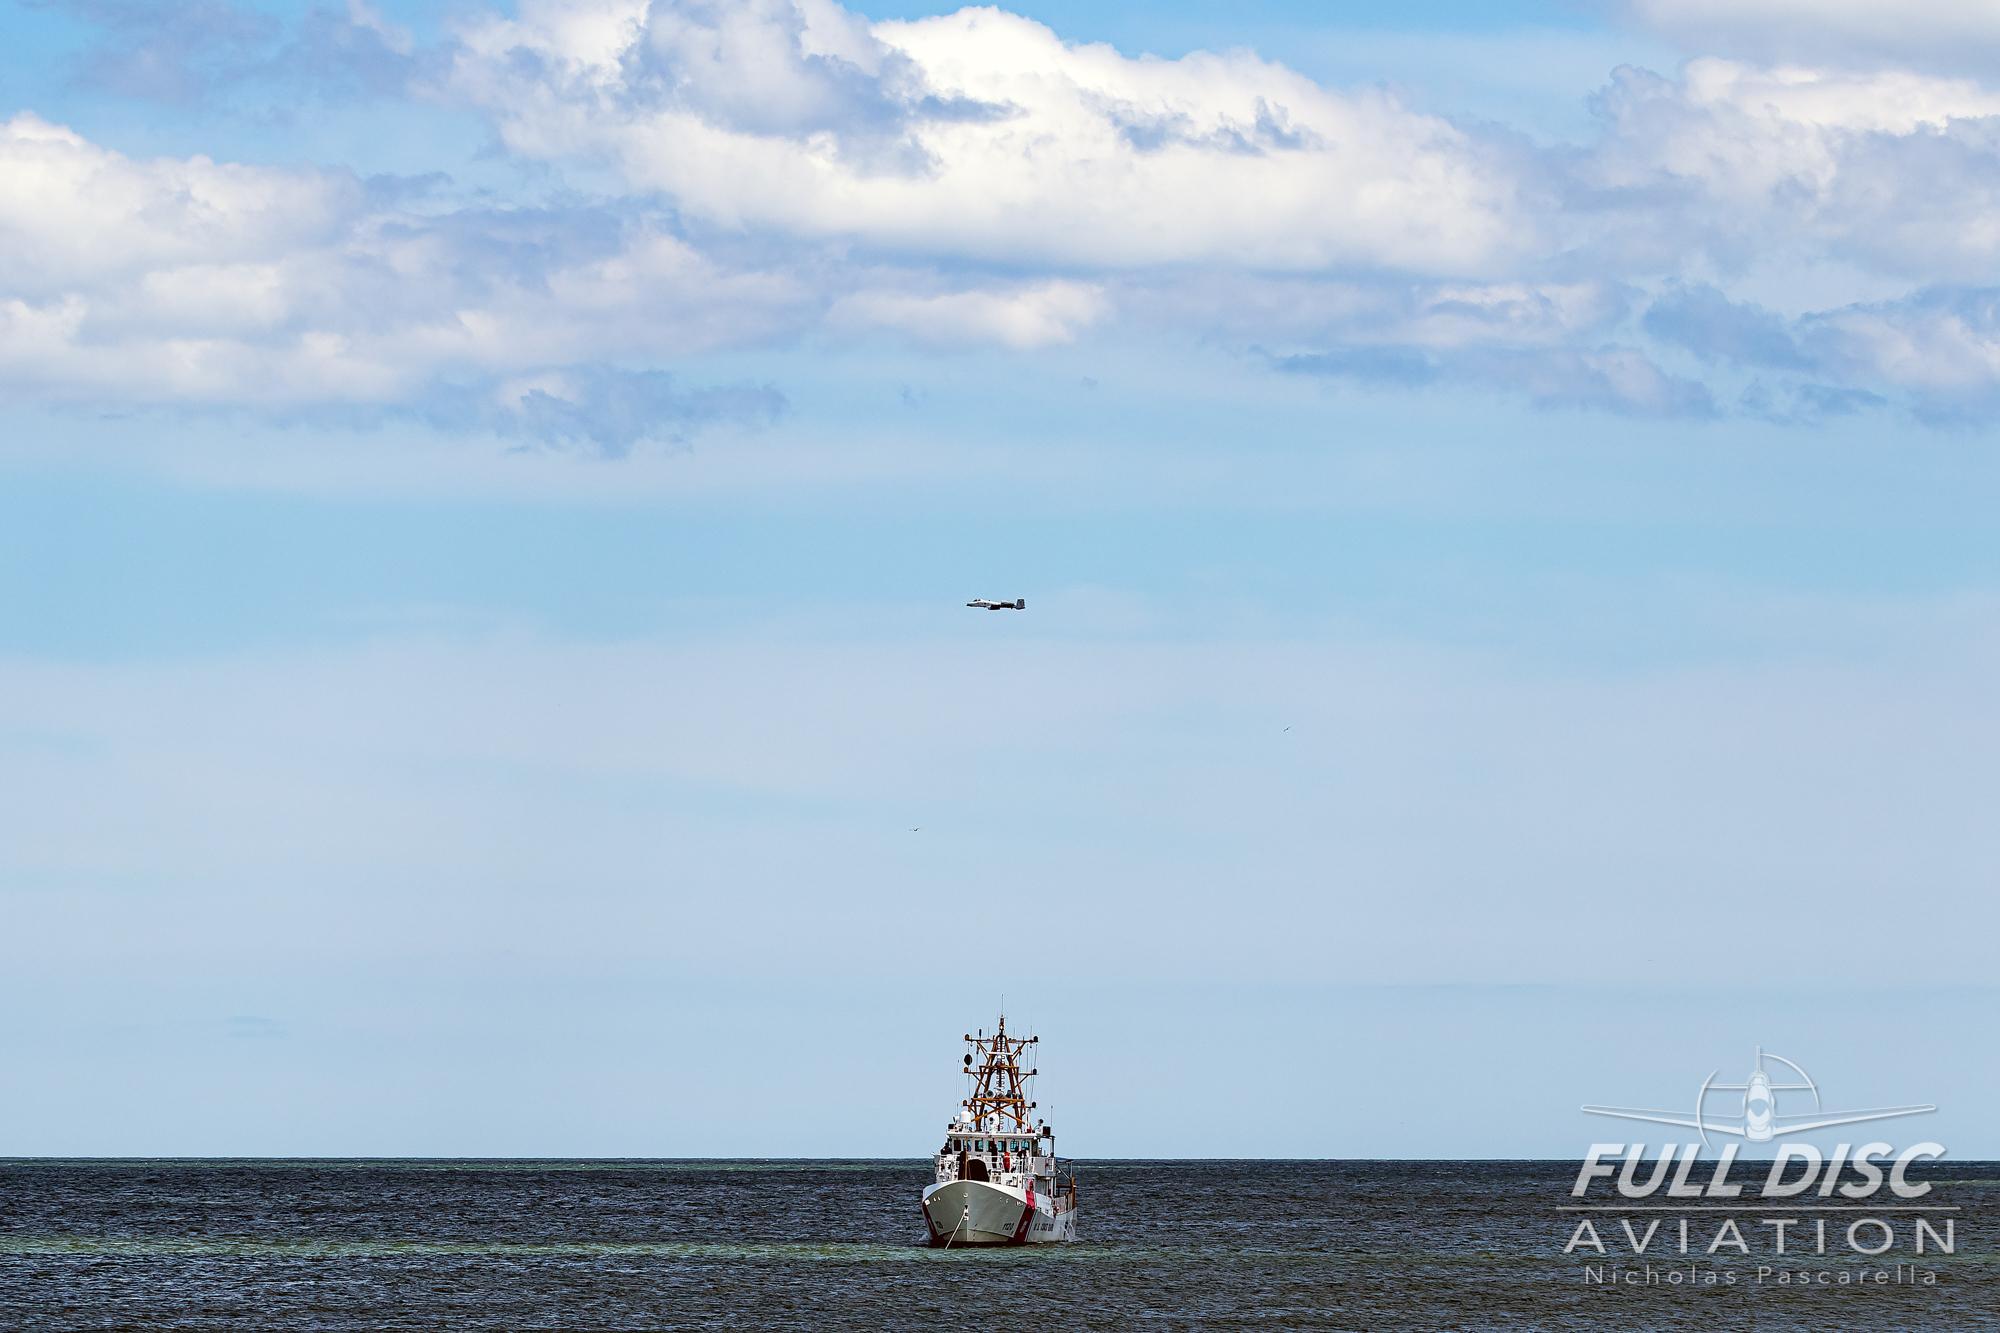 nickpascarella_fulldiscaviation_oceancityairshow_aviation_warthog_scene_coastguard.jpg